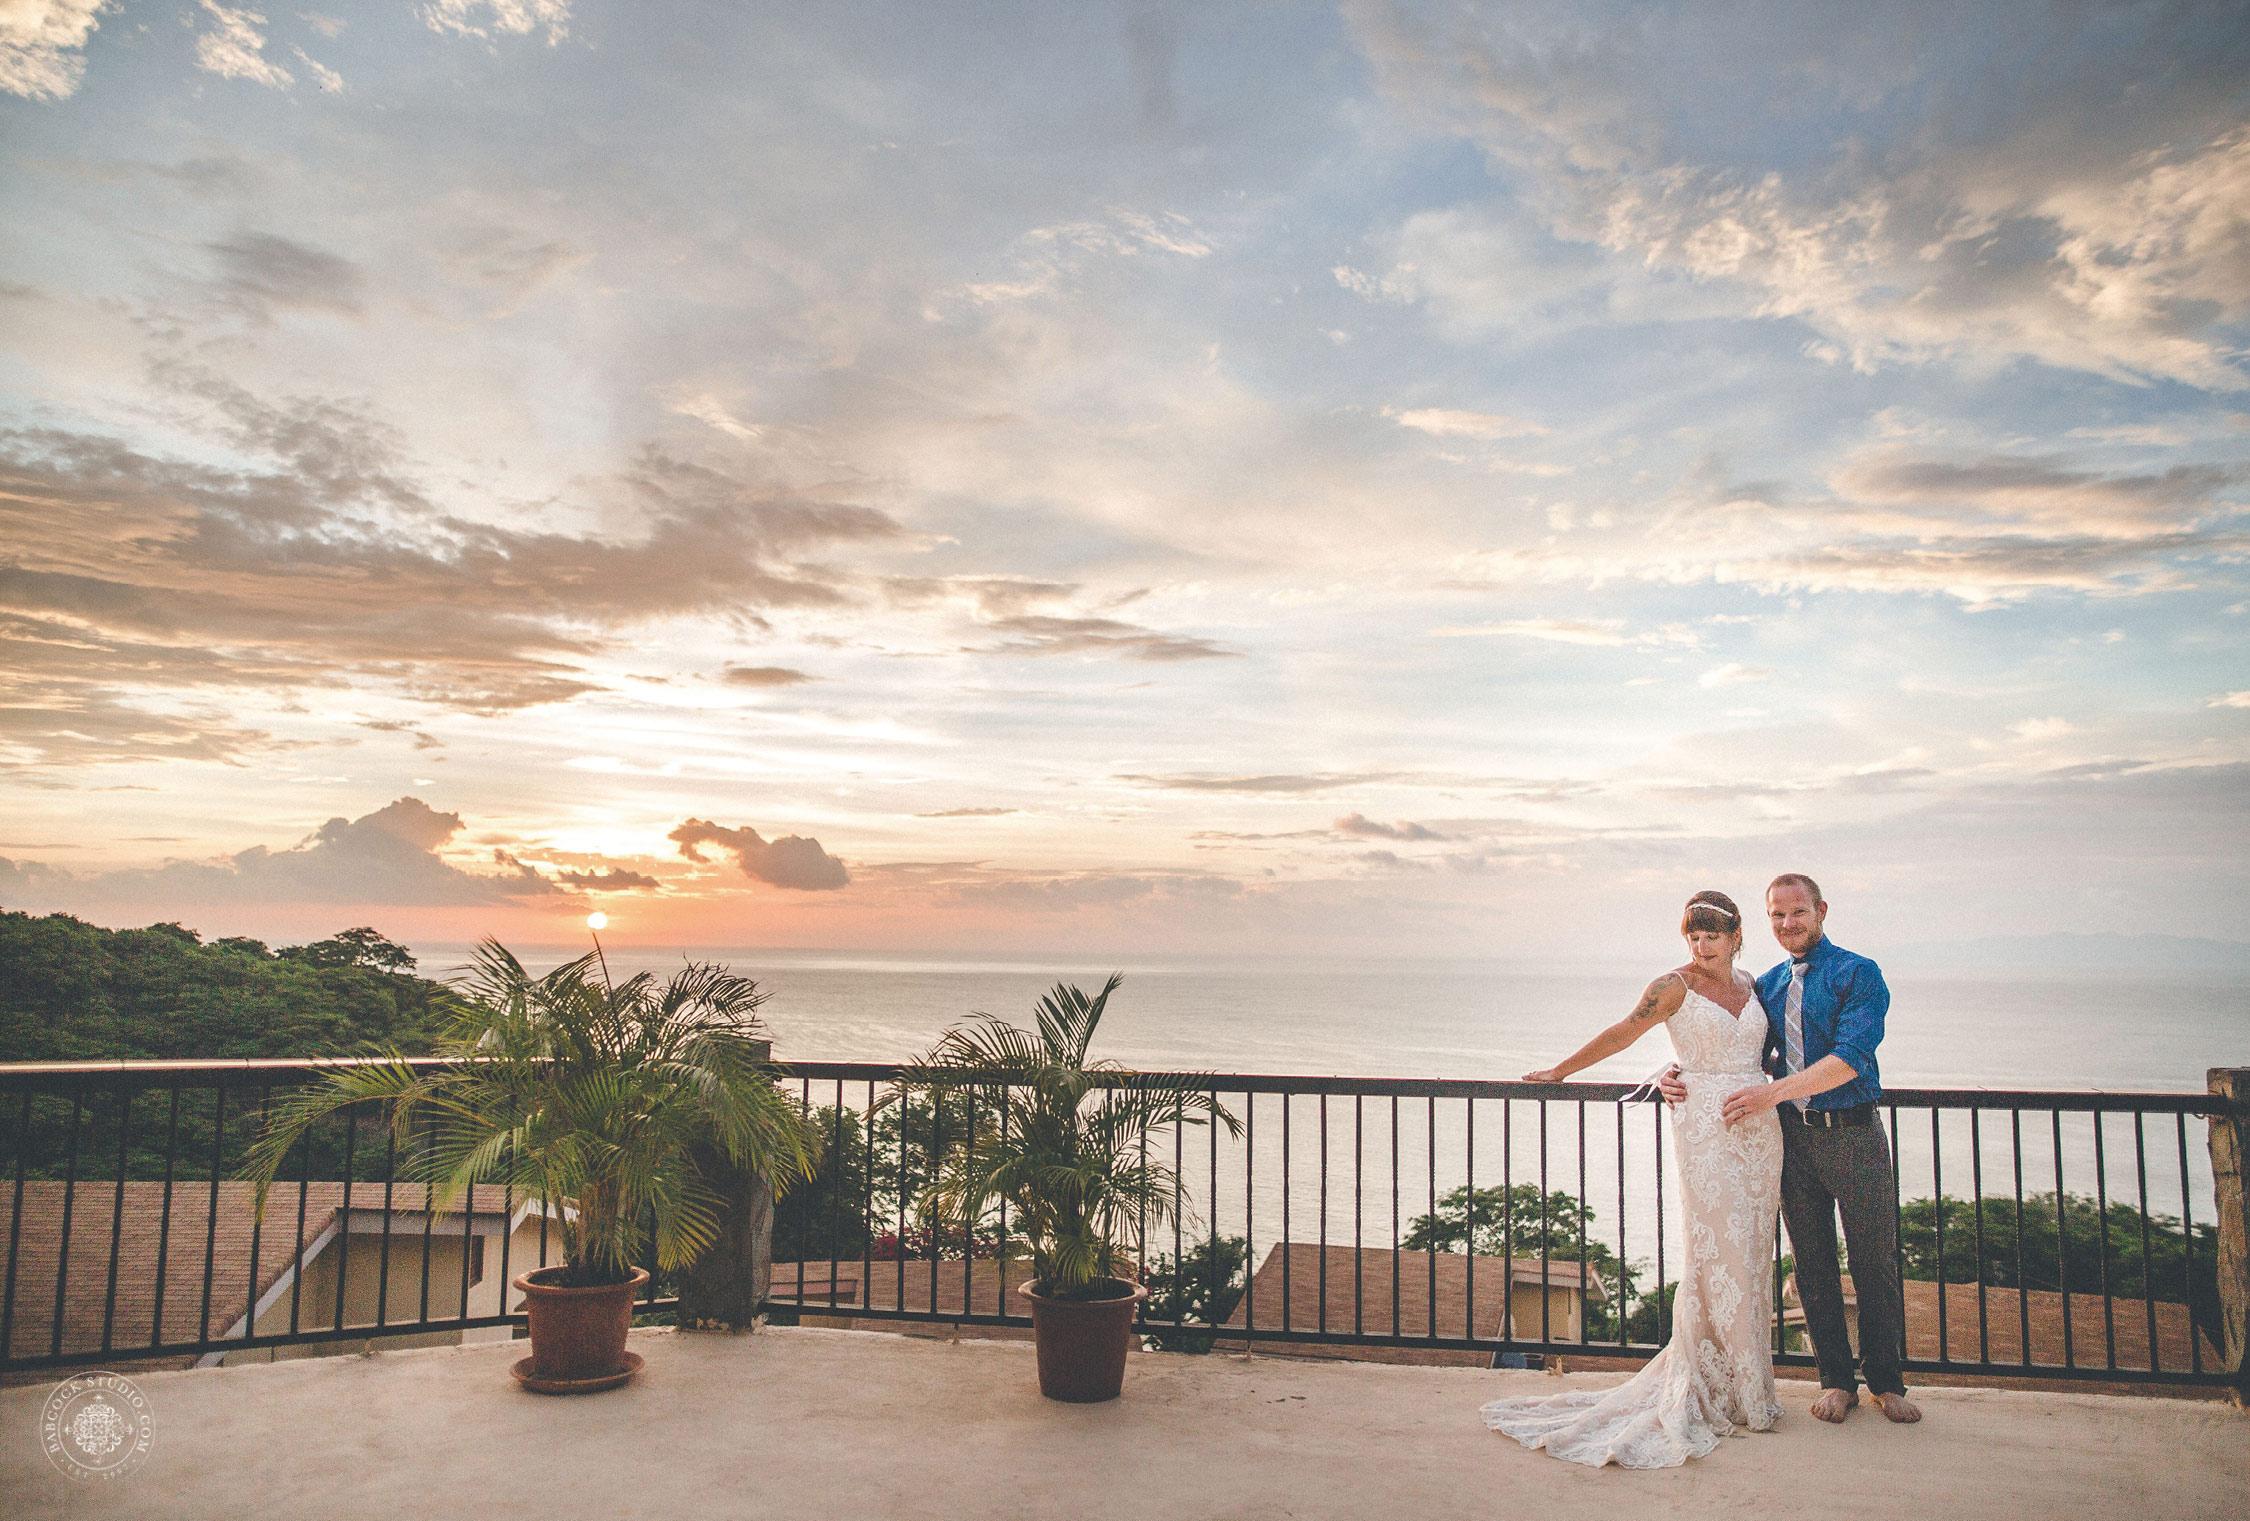 2cat-brandon-costa-rica-destination-wedding-photographer-dayton-ohio-31.jpg